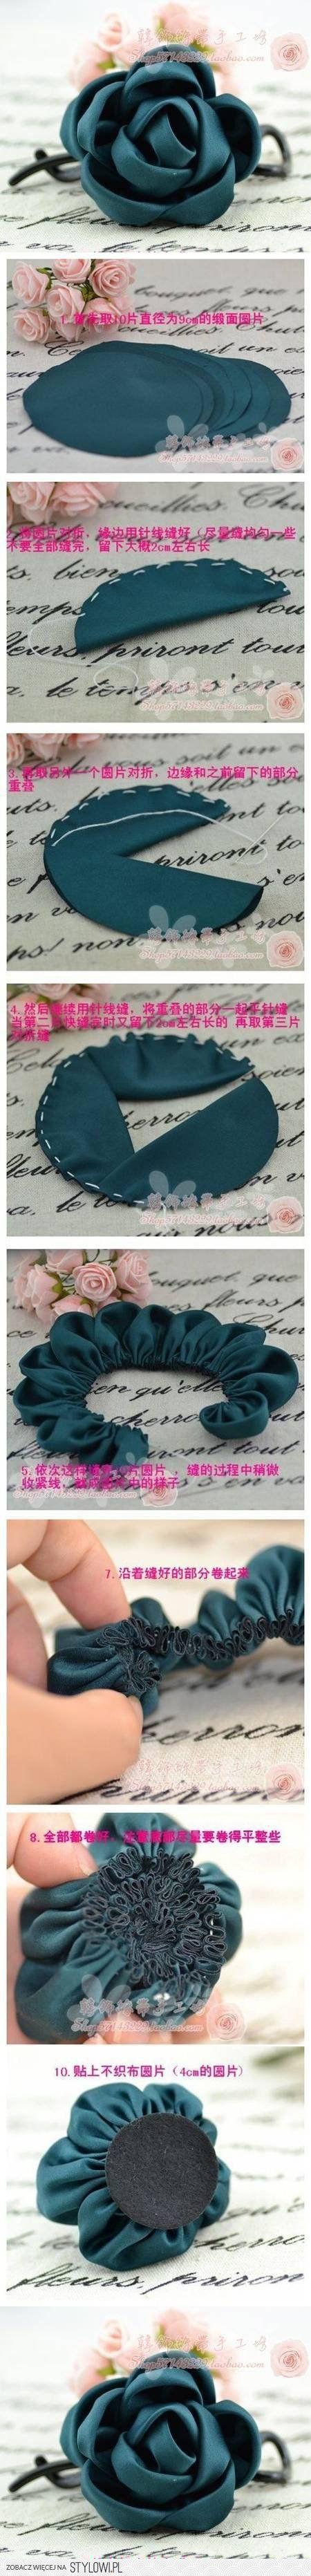 DIY Easy Fabric Roses DIY Projects | UsefulDIY.com na Stylowi.pl